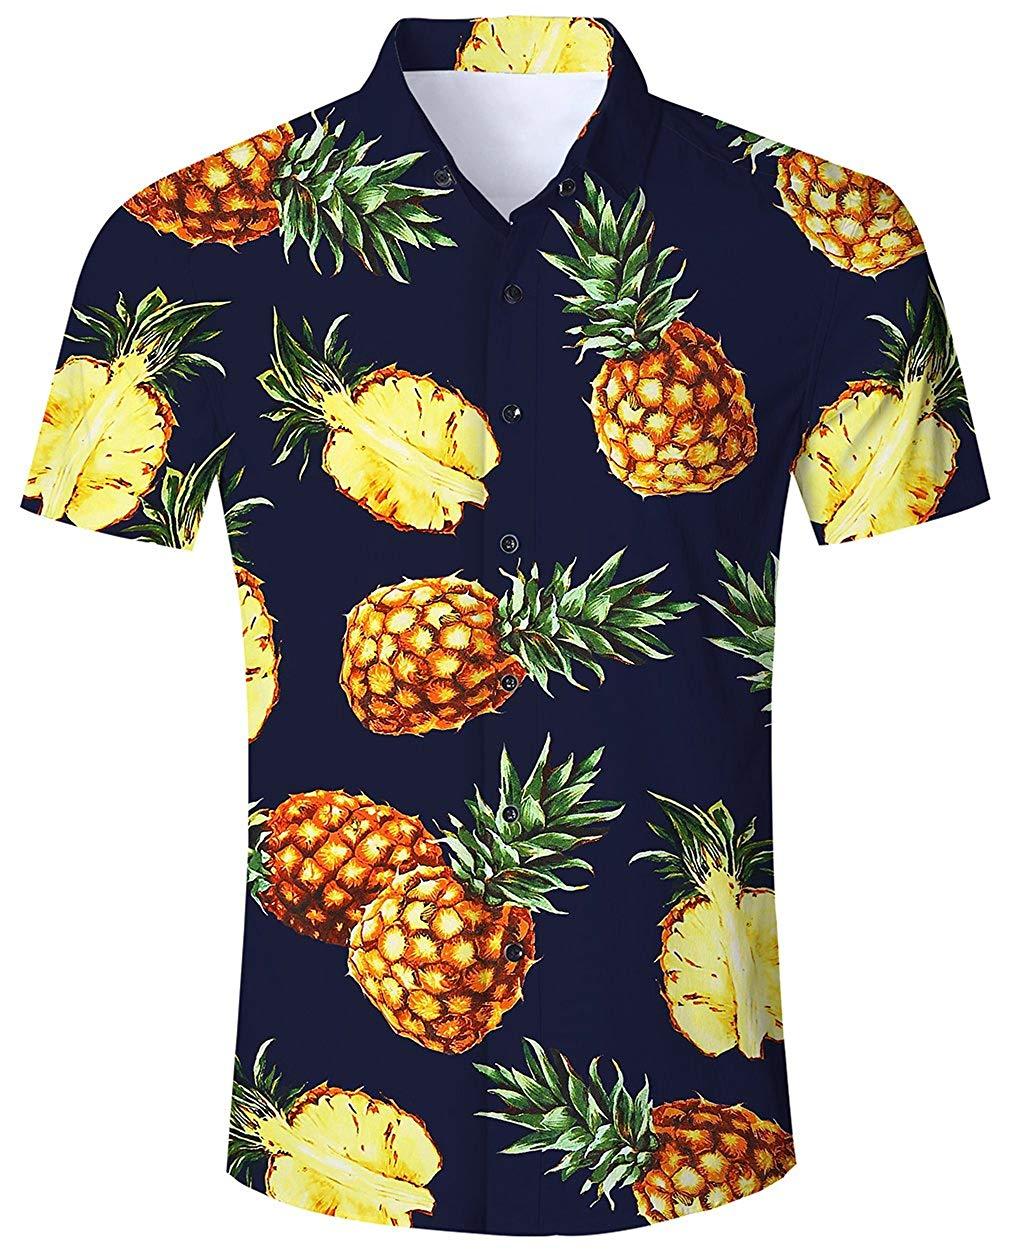 7c0ebc5c05c4 Camisa Hawaiana para Hombre Mujer Casual Manga Corta Camisas Playa Verano  Unisex 3D Estampada Funny Hawaii Piña - Negra